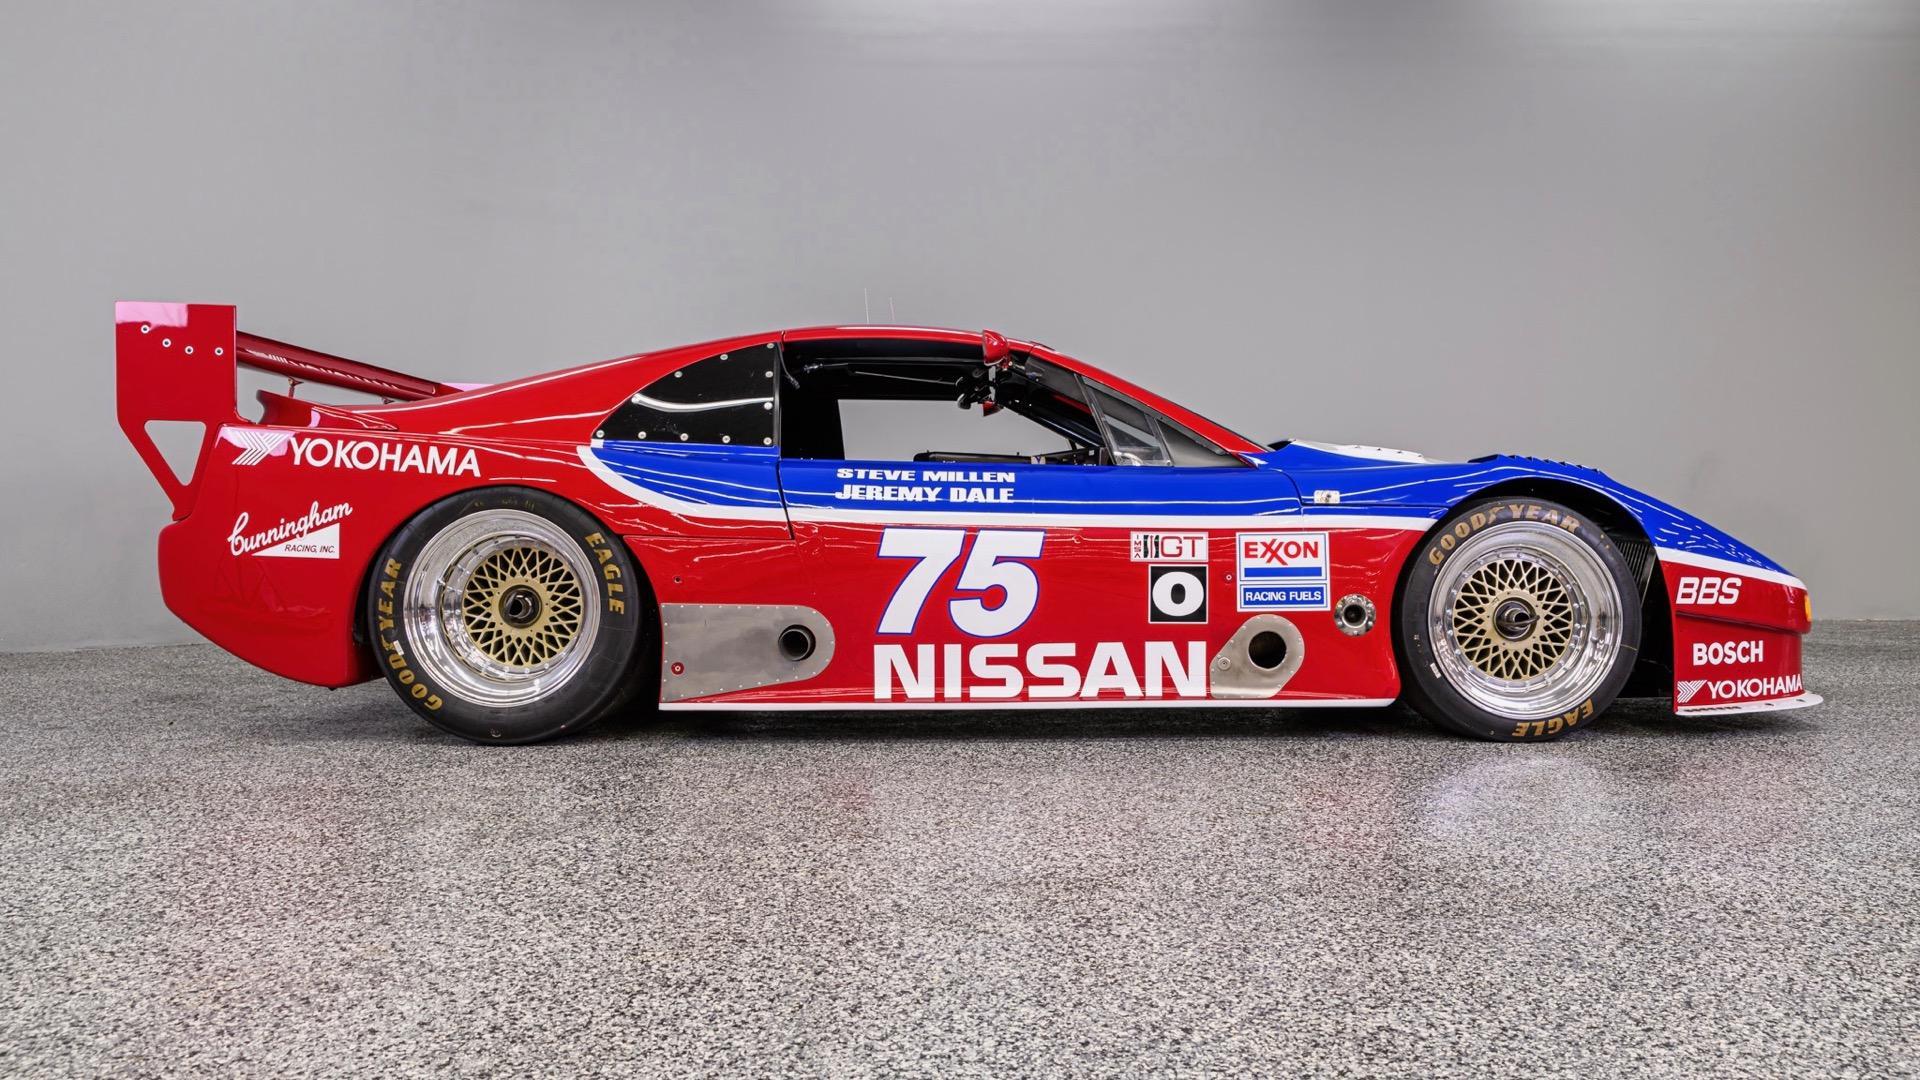 1990 nissan 300zx twin turbo imsa gto race car photo by bring a trailer 100791729 h